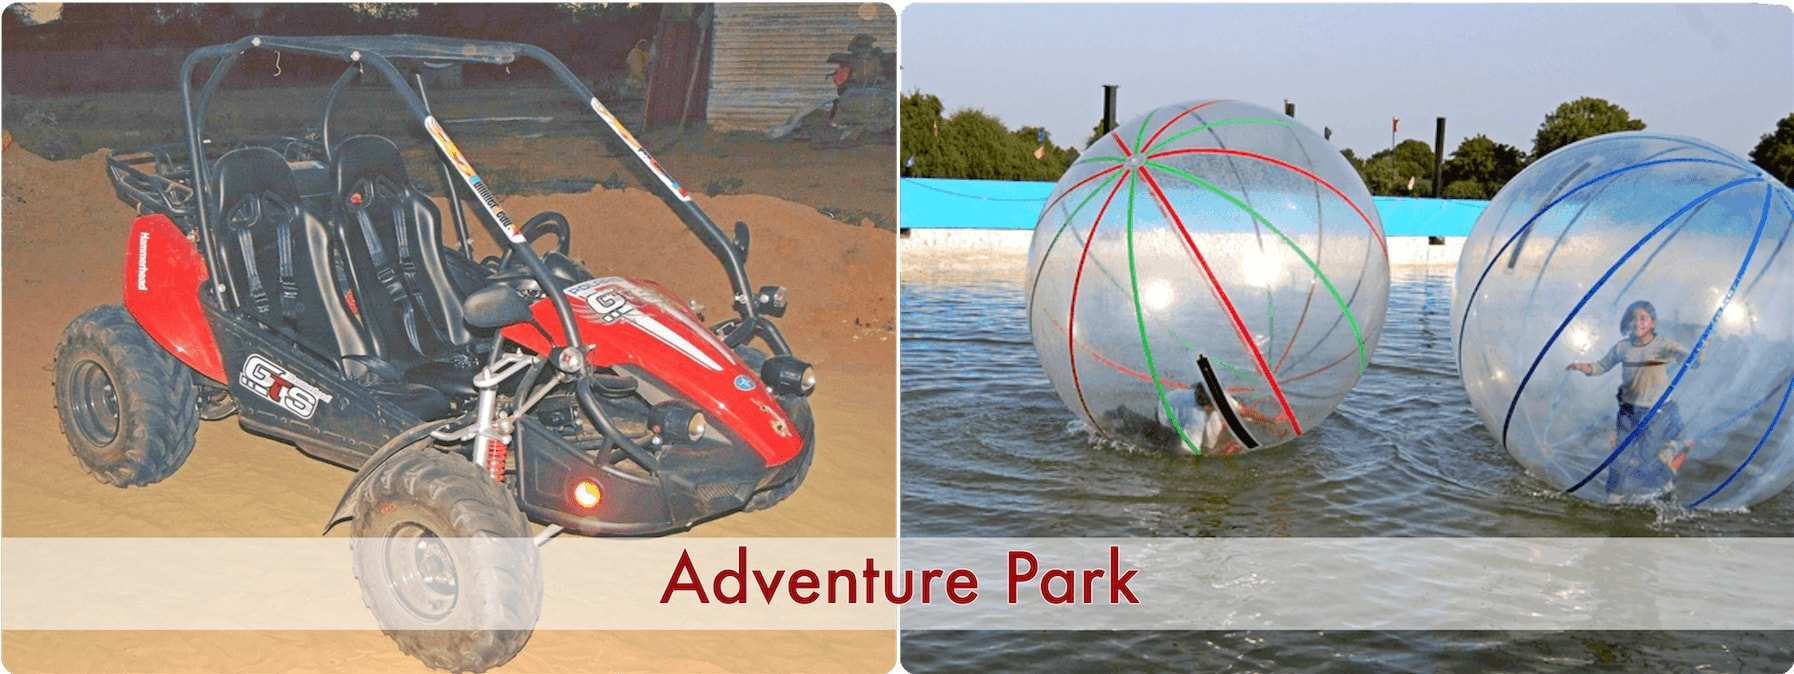 Adventure-park.jpg